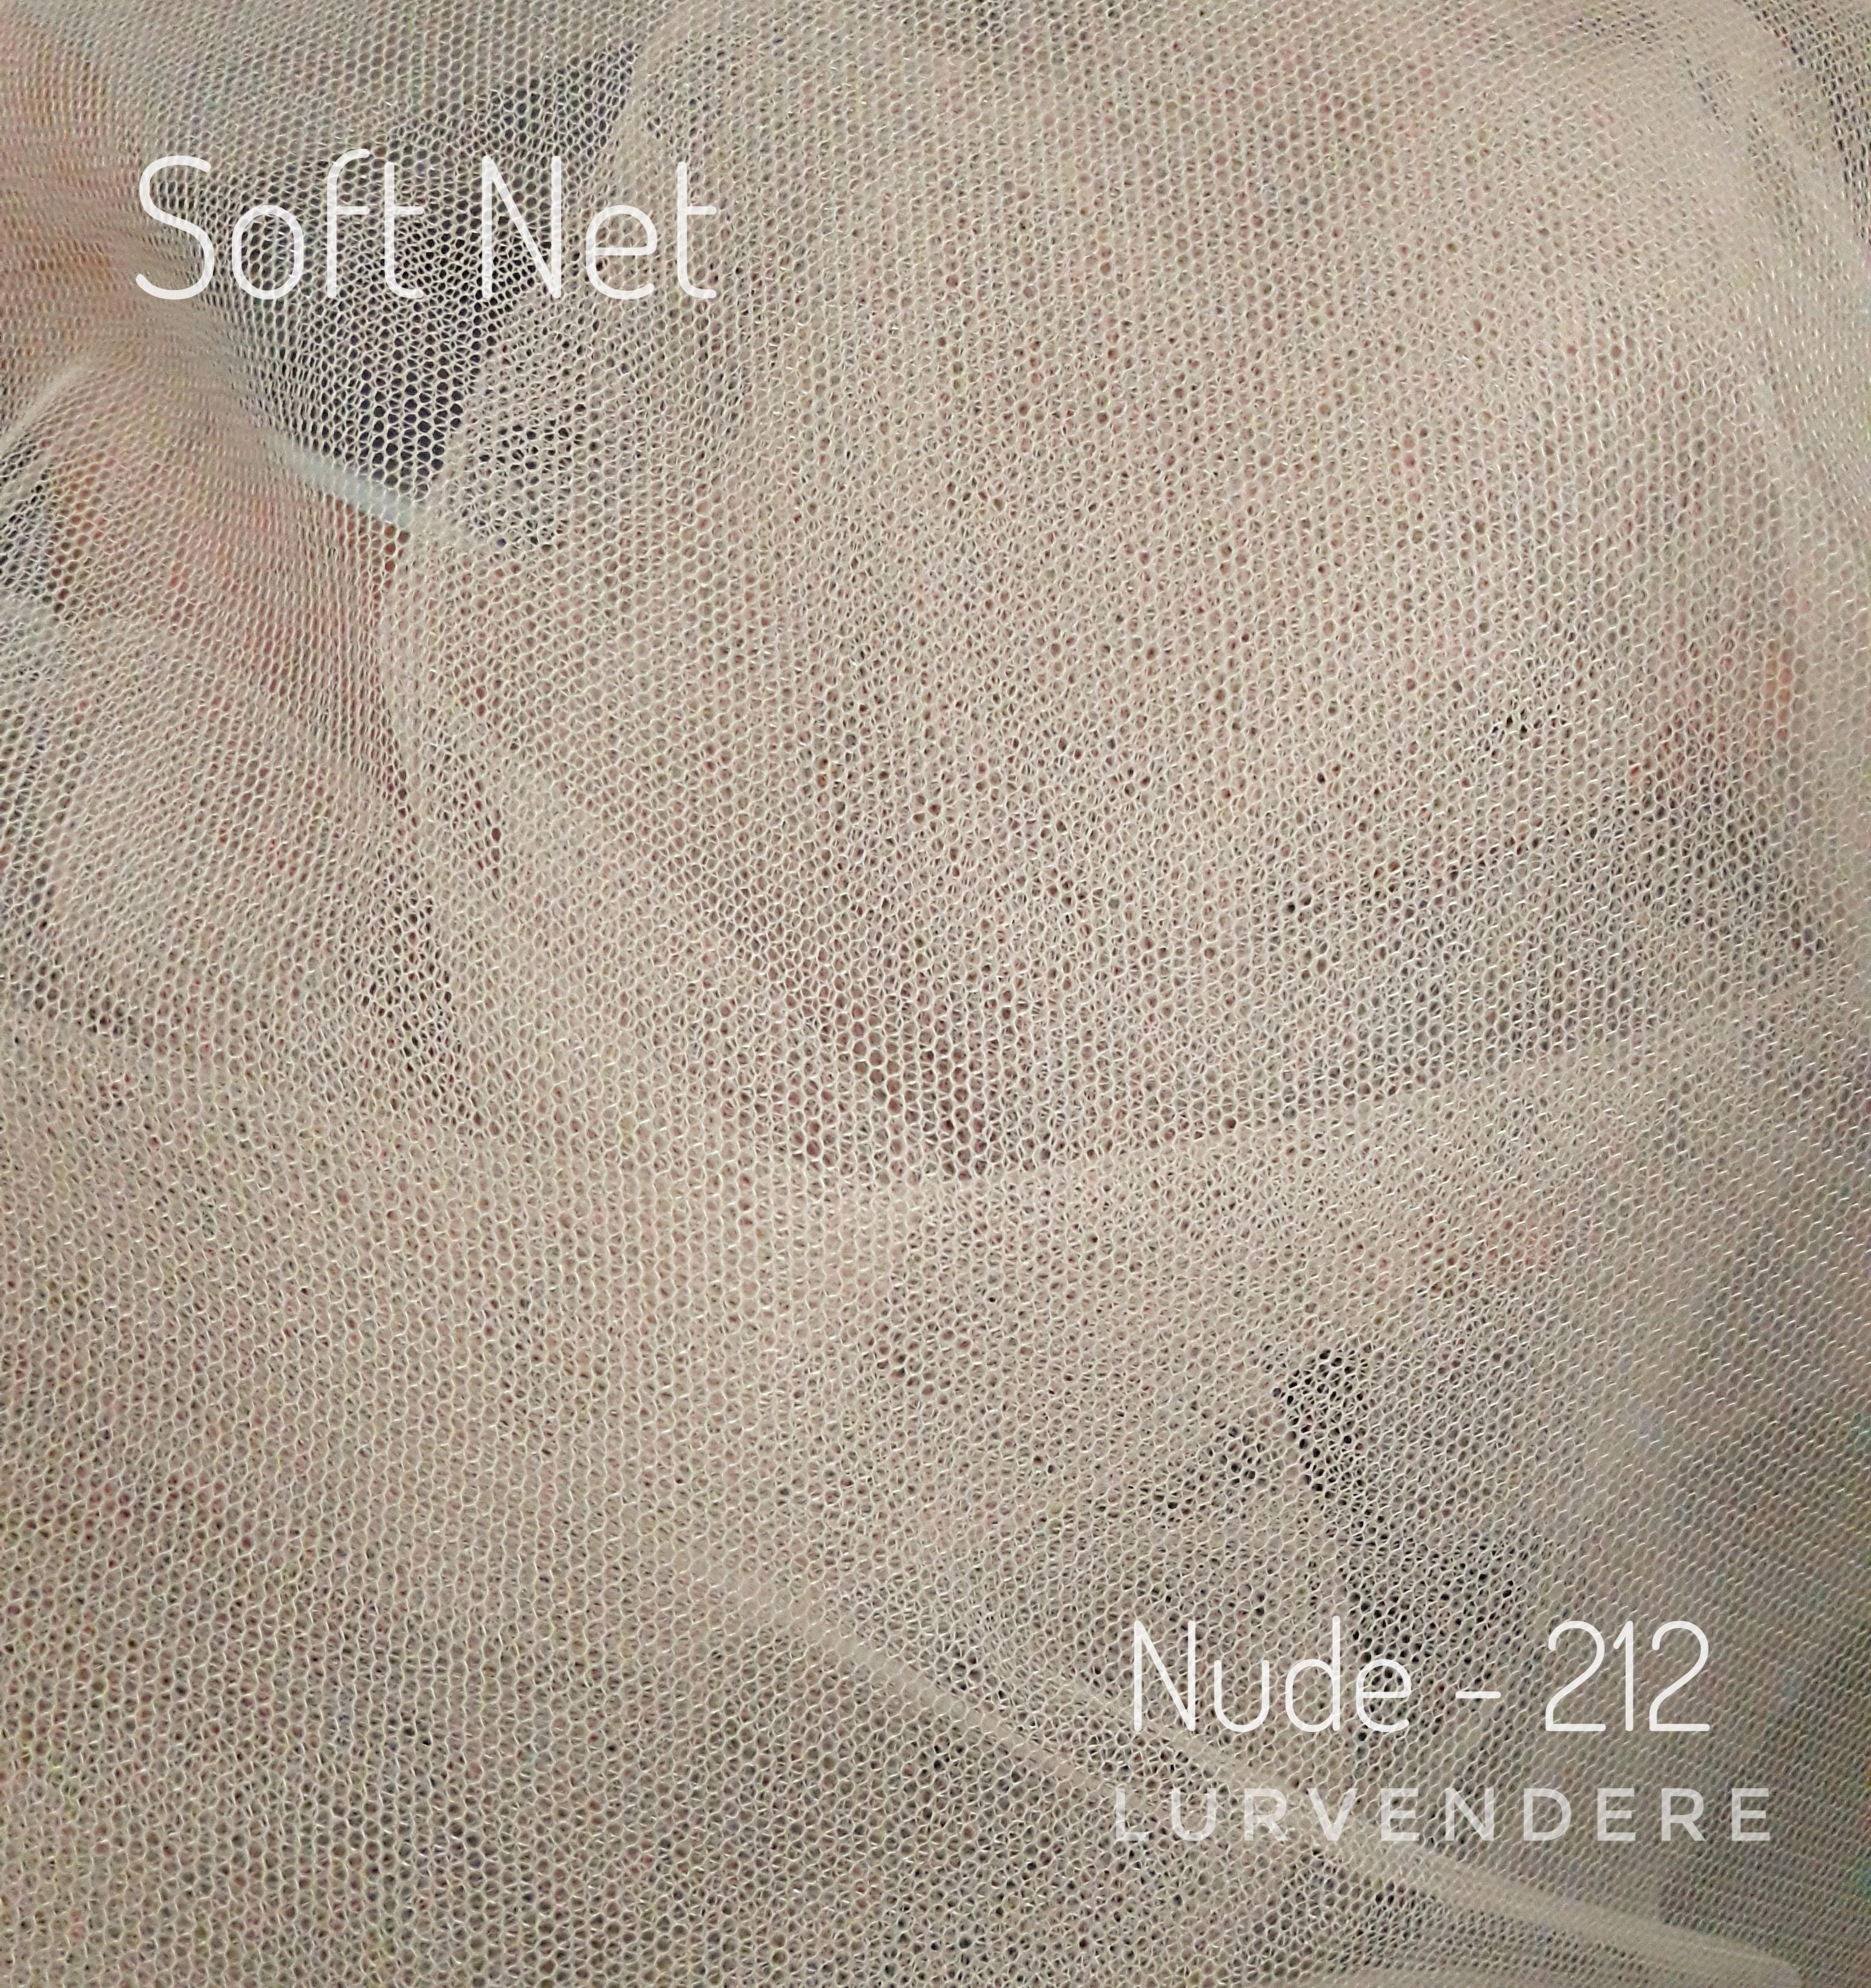 Soft Net - Nude ( 212 )